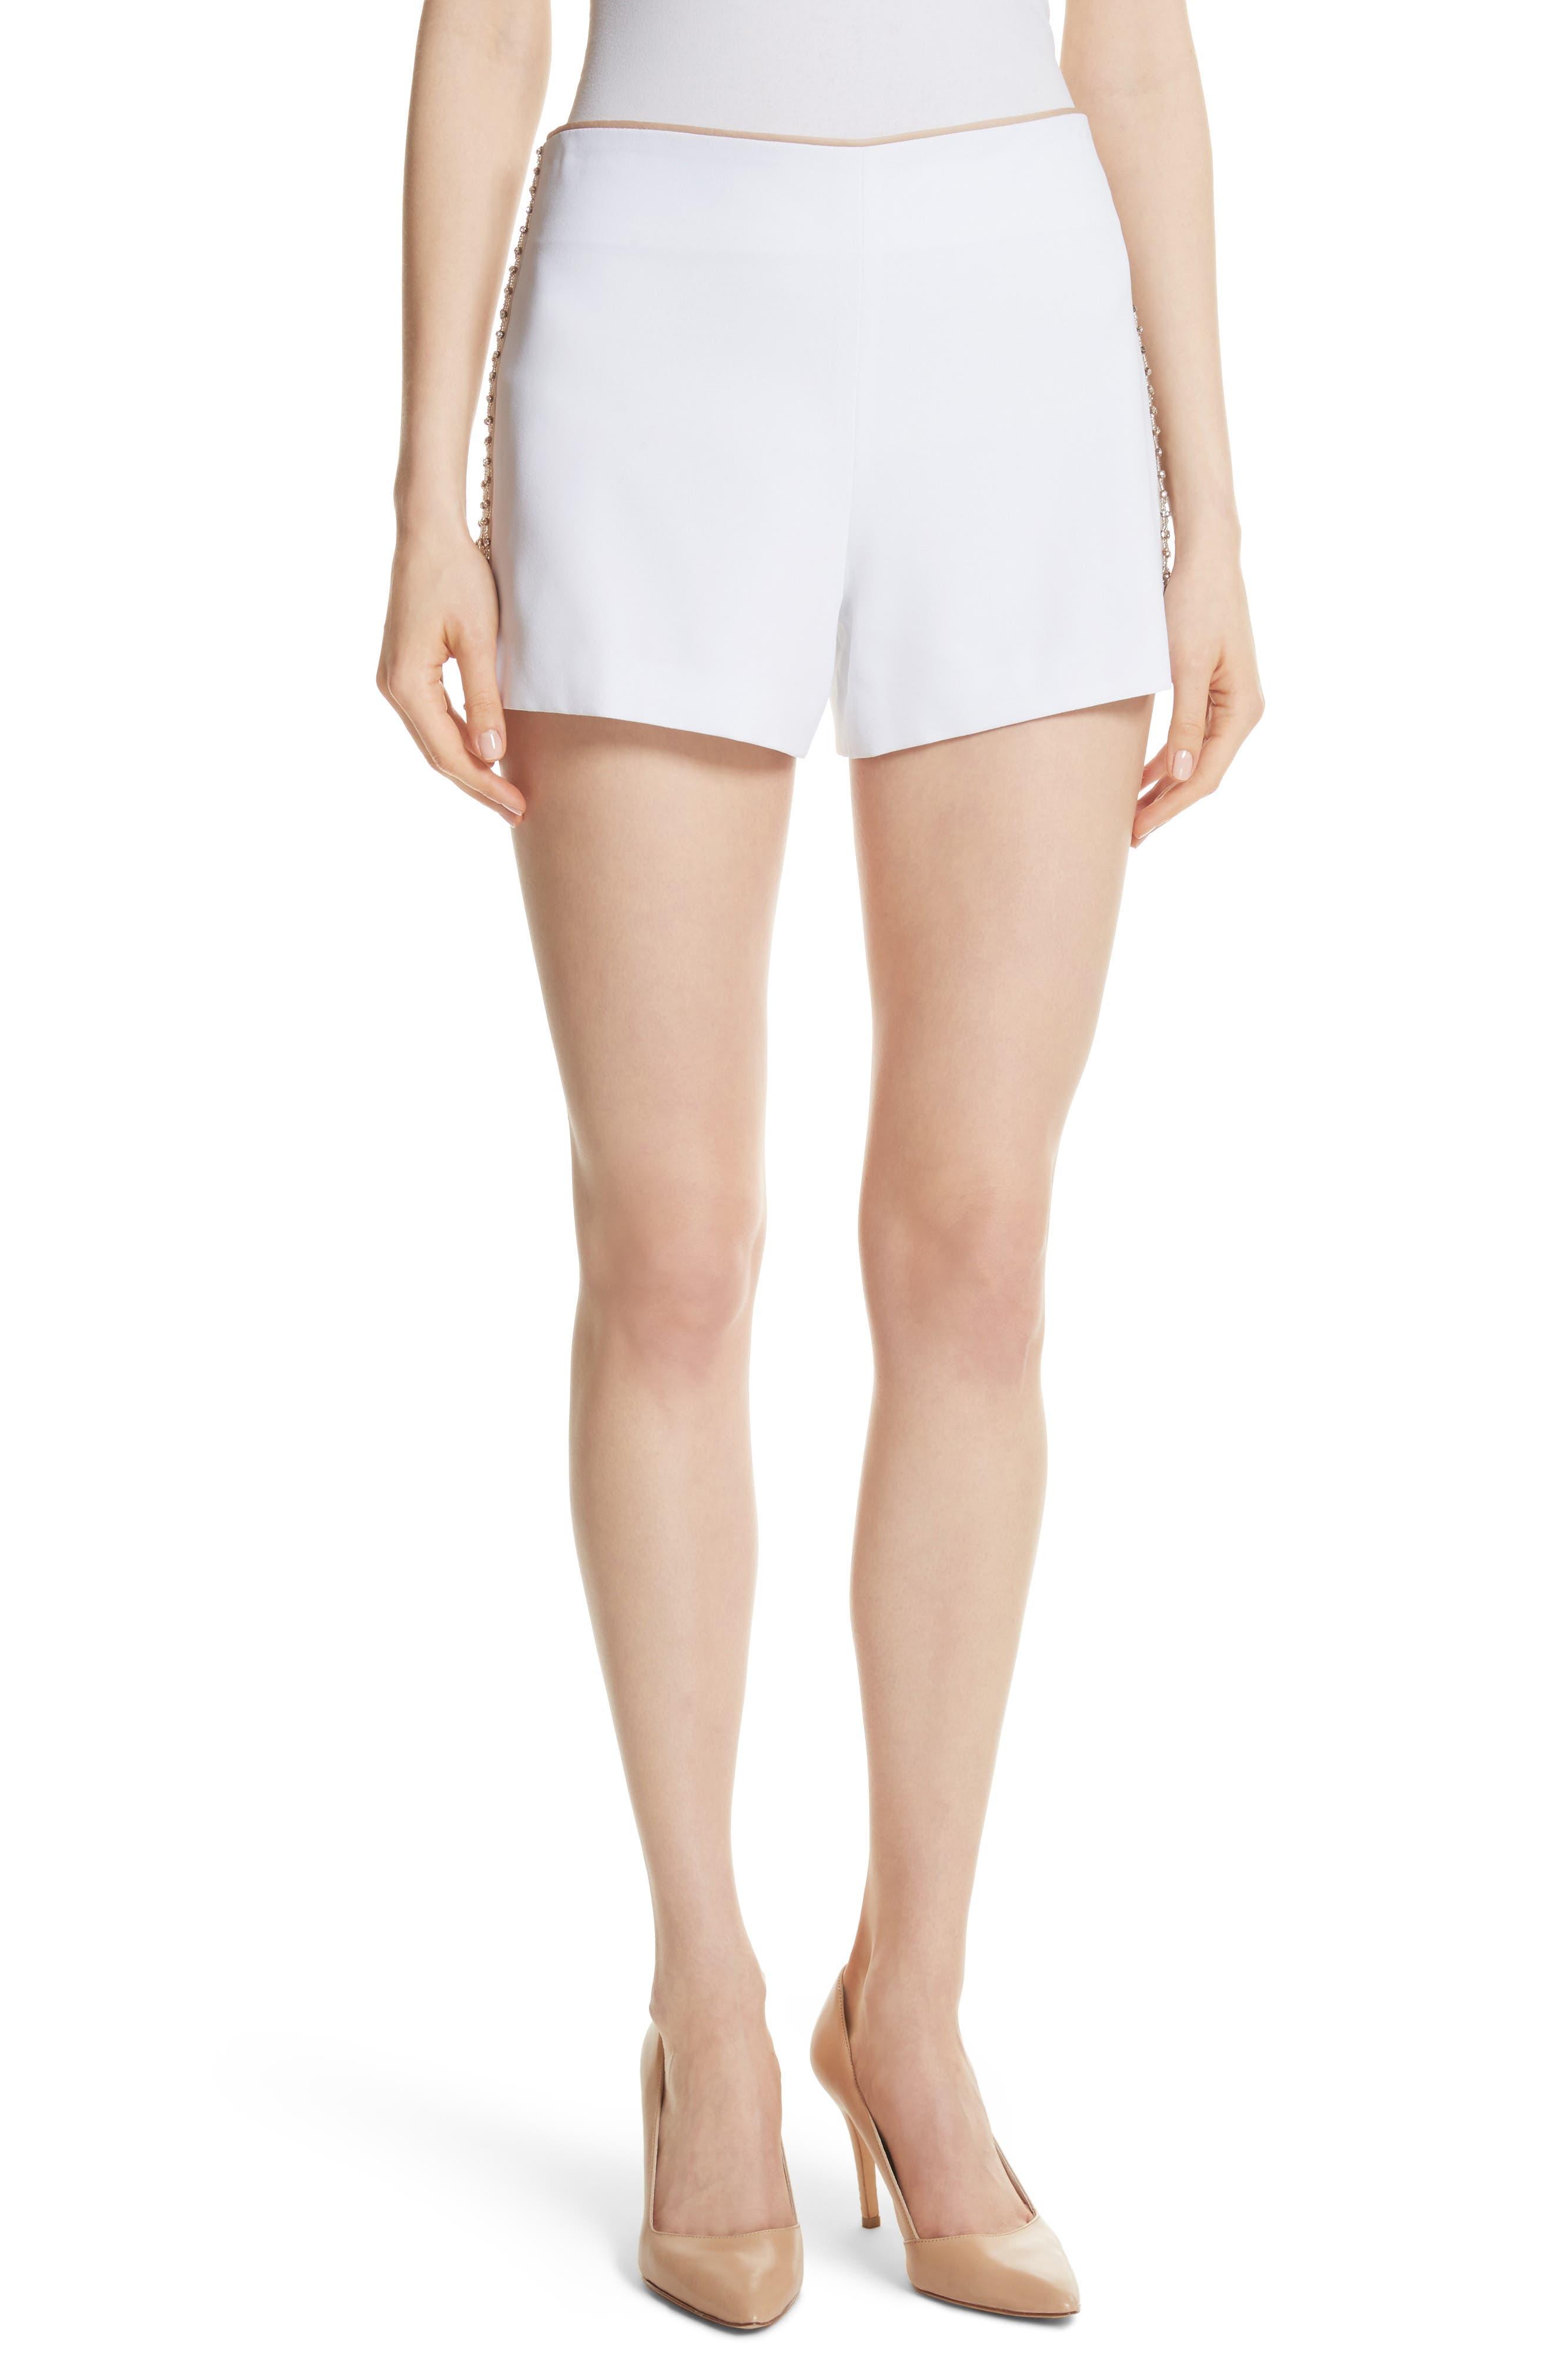 Sherri Embellished Shorts,                         Main,                         color, 100